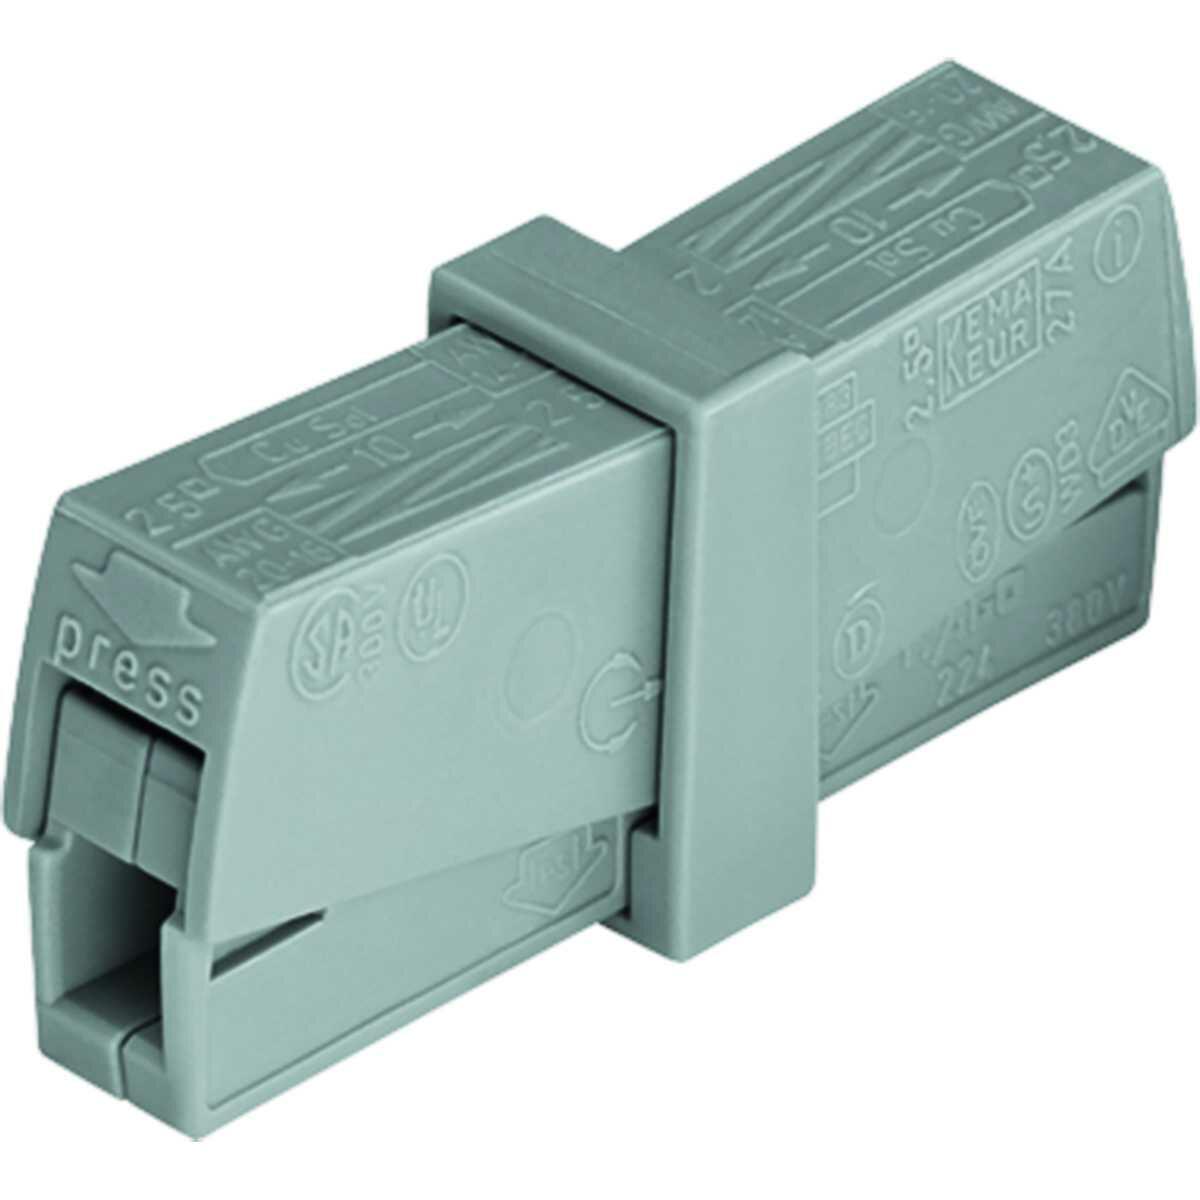 Conector Emenda 221-612 2 Deriv 6Mm2 Wago 3 Peças